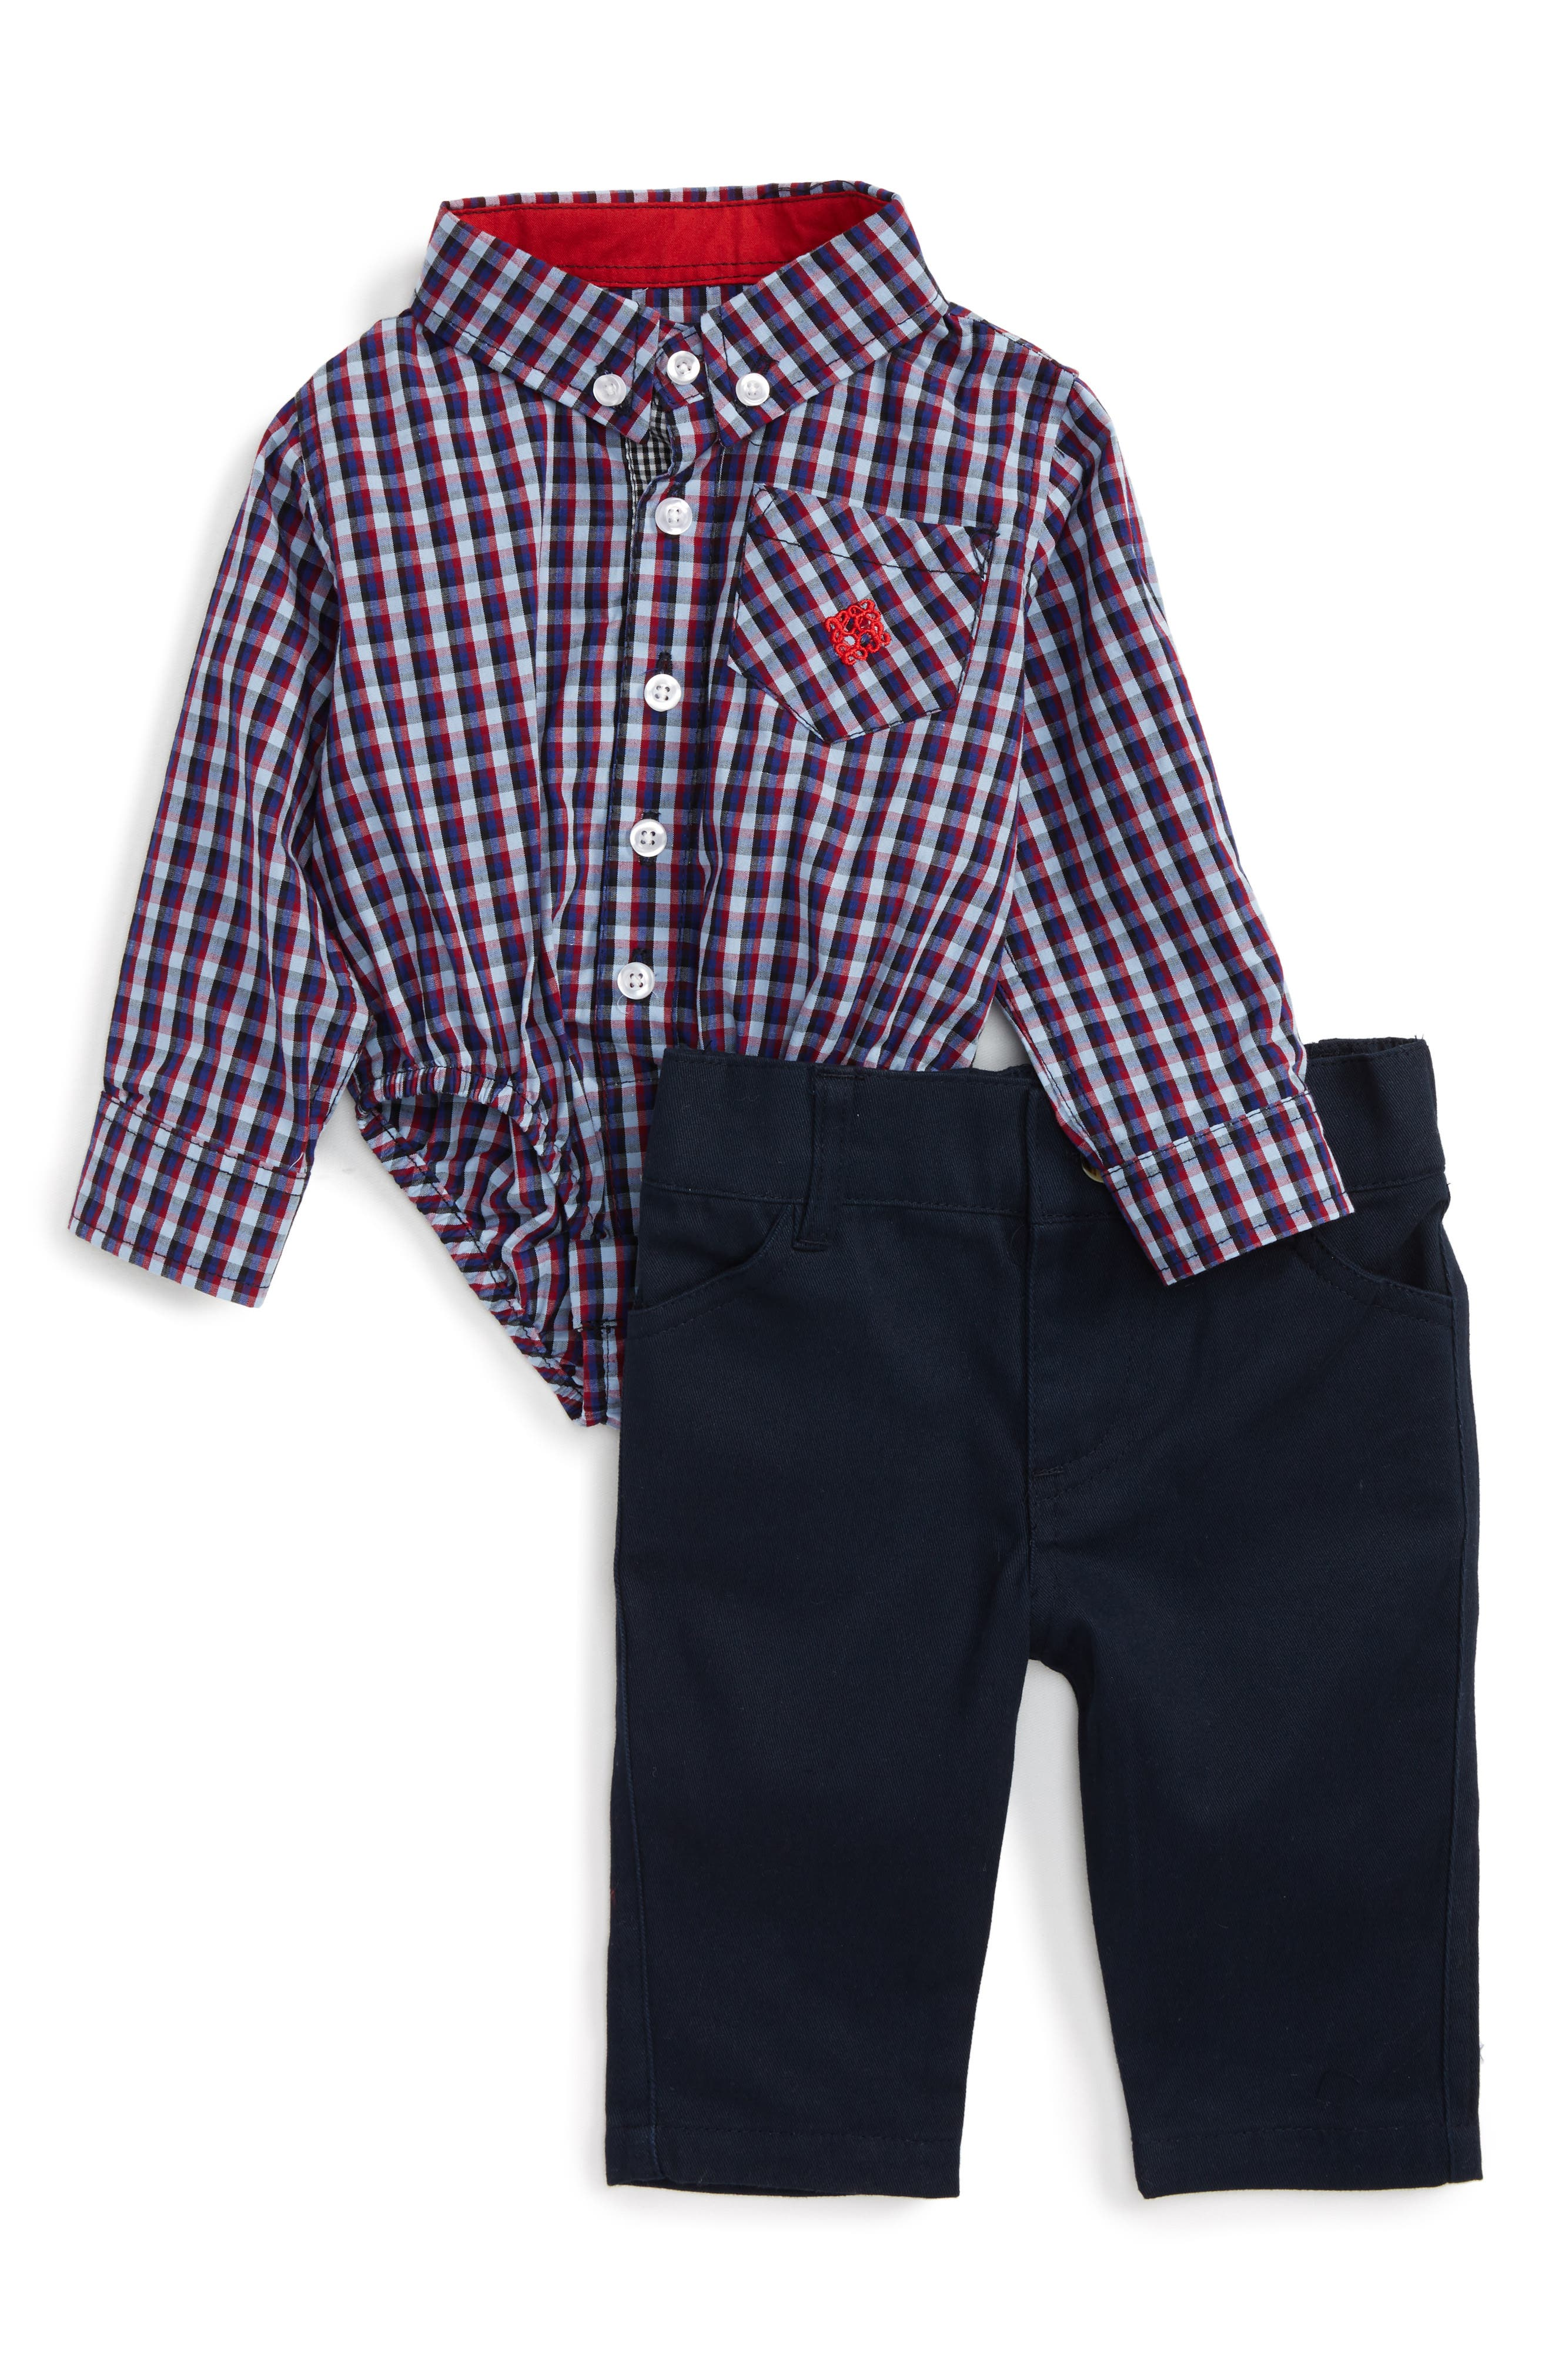 Alternate Image 1 Selected - Andy & Evan Shirtzie Check Bodysuit & Pants Set (Baby Boys)